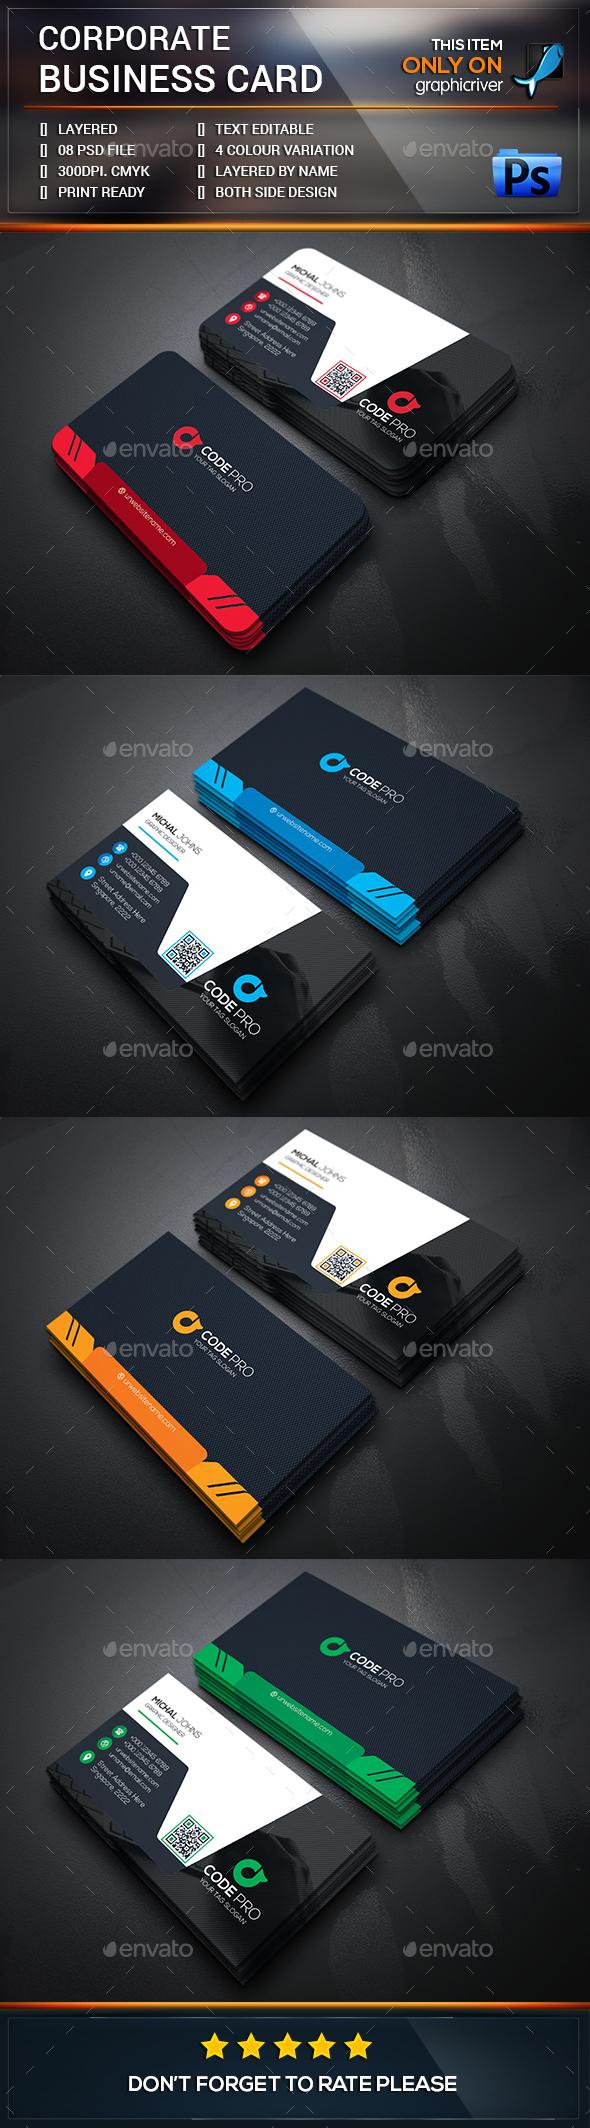 Smart corporate business card template psd design download http smart corporate business card template psd design download http graphicriver reheart Gallery